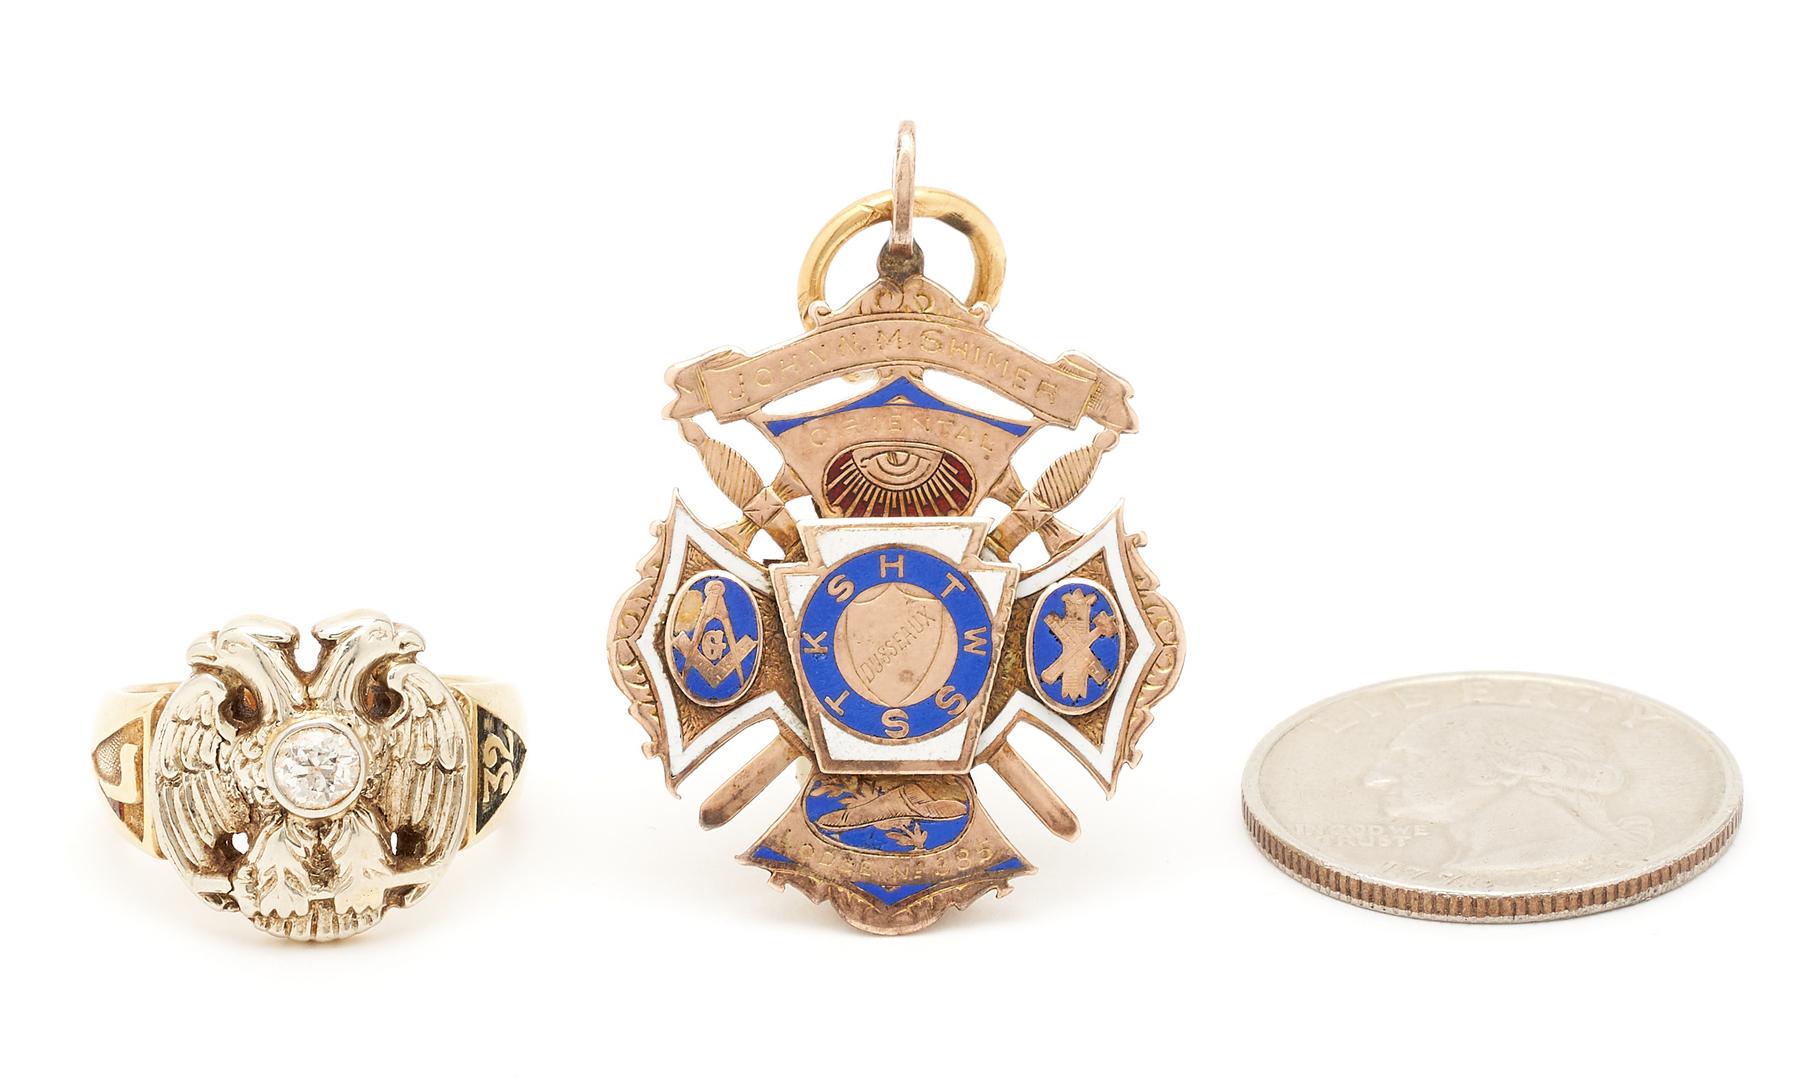 Lot 270: 2 Masonic Jewelry Items, 1 Ring & 1 Pendant